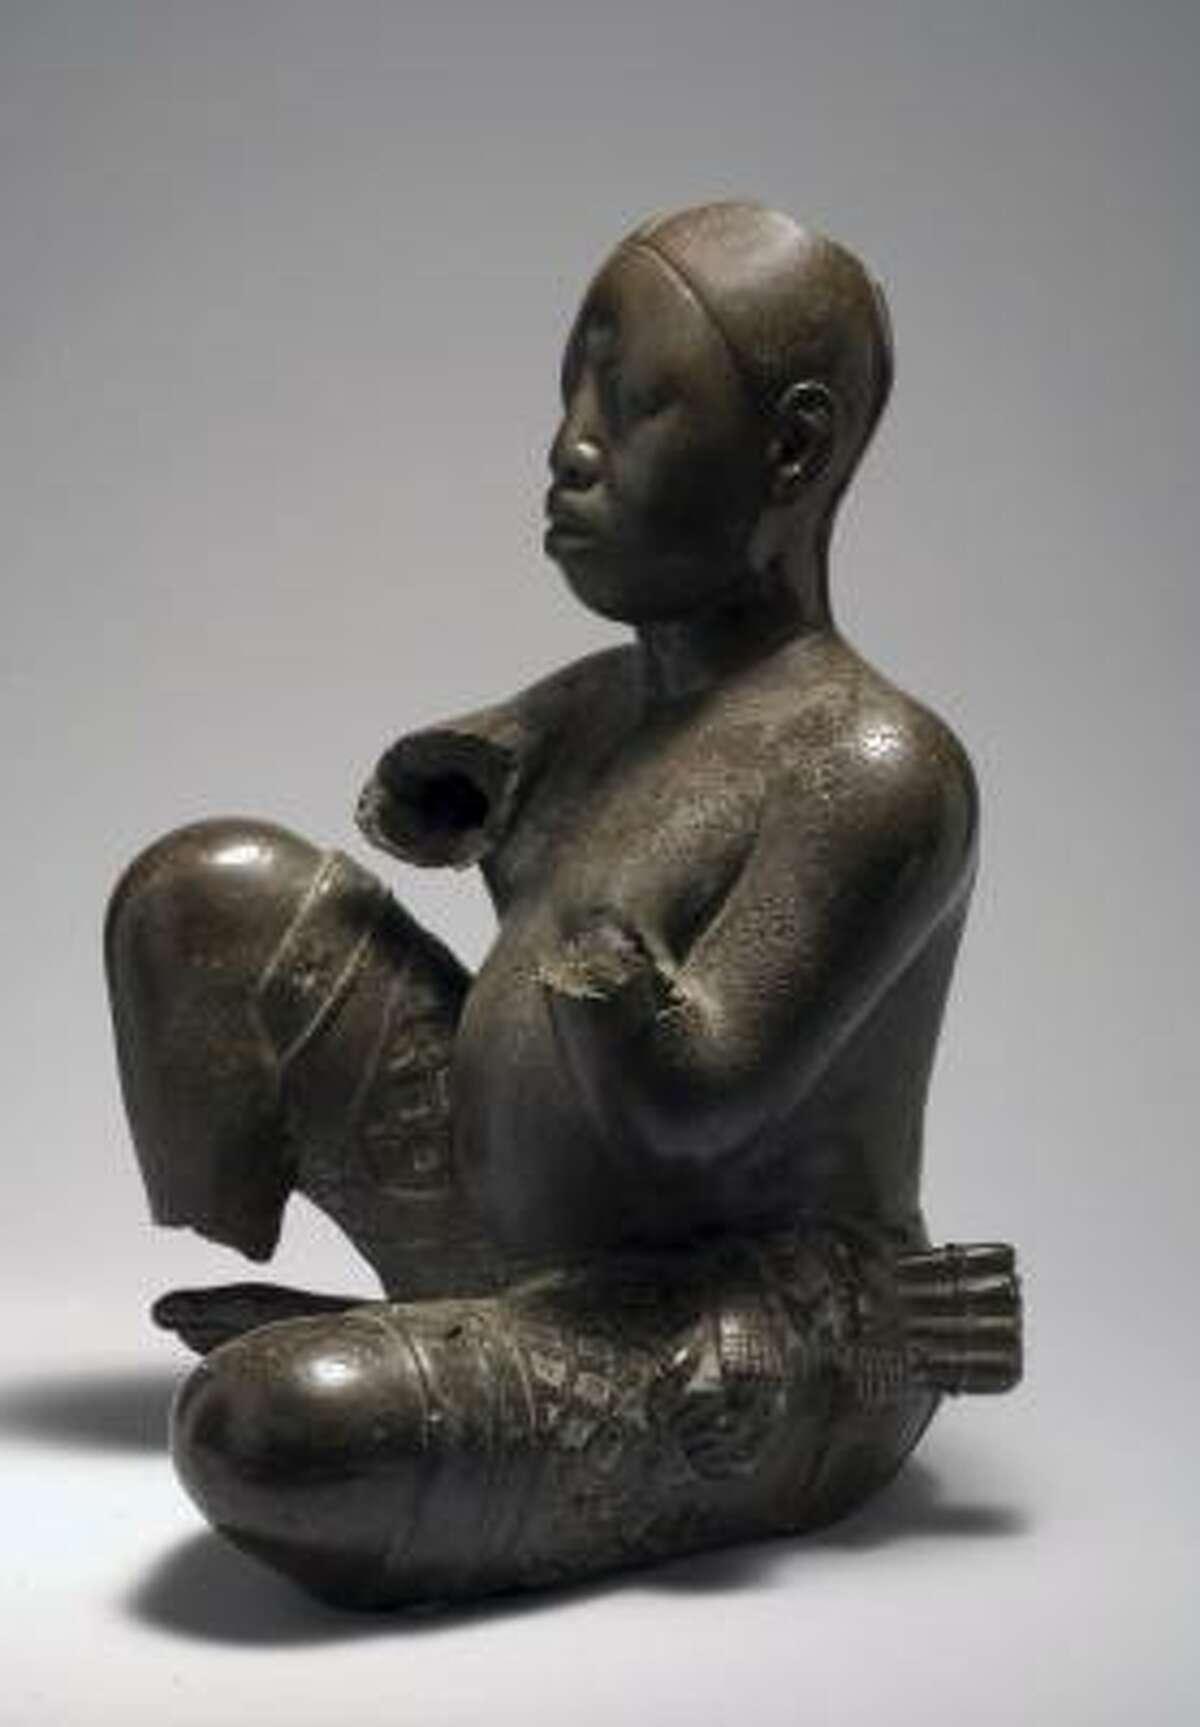 Seated figure Tada, late 13th-14th century Copper